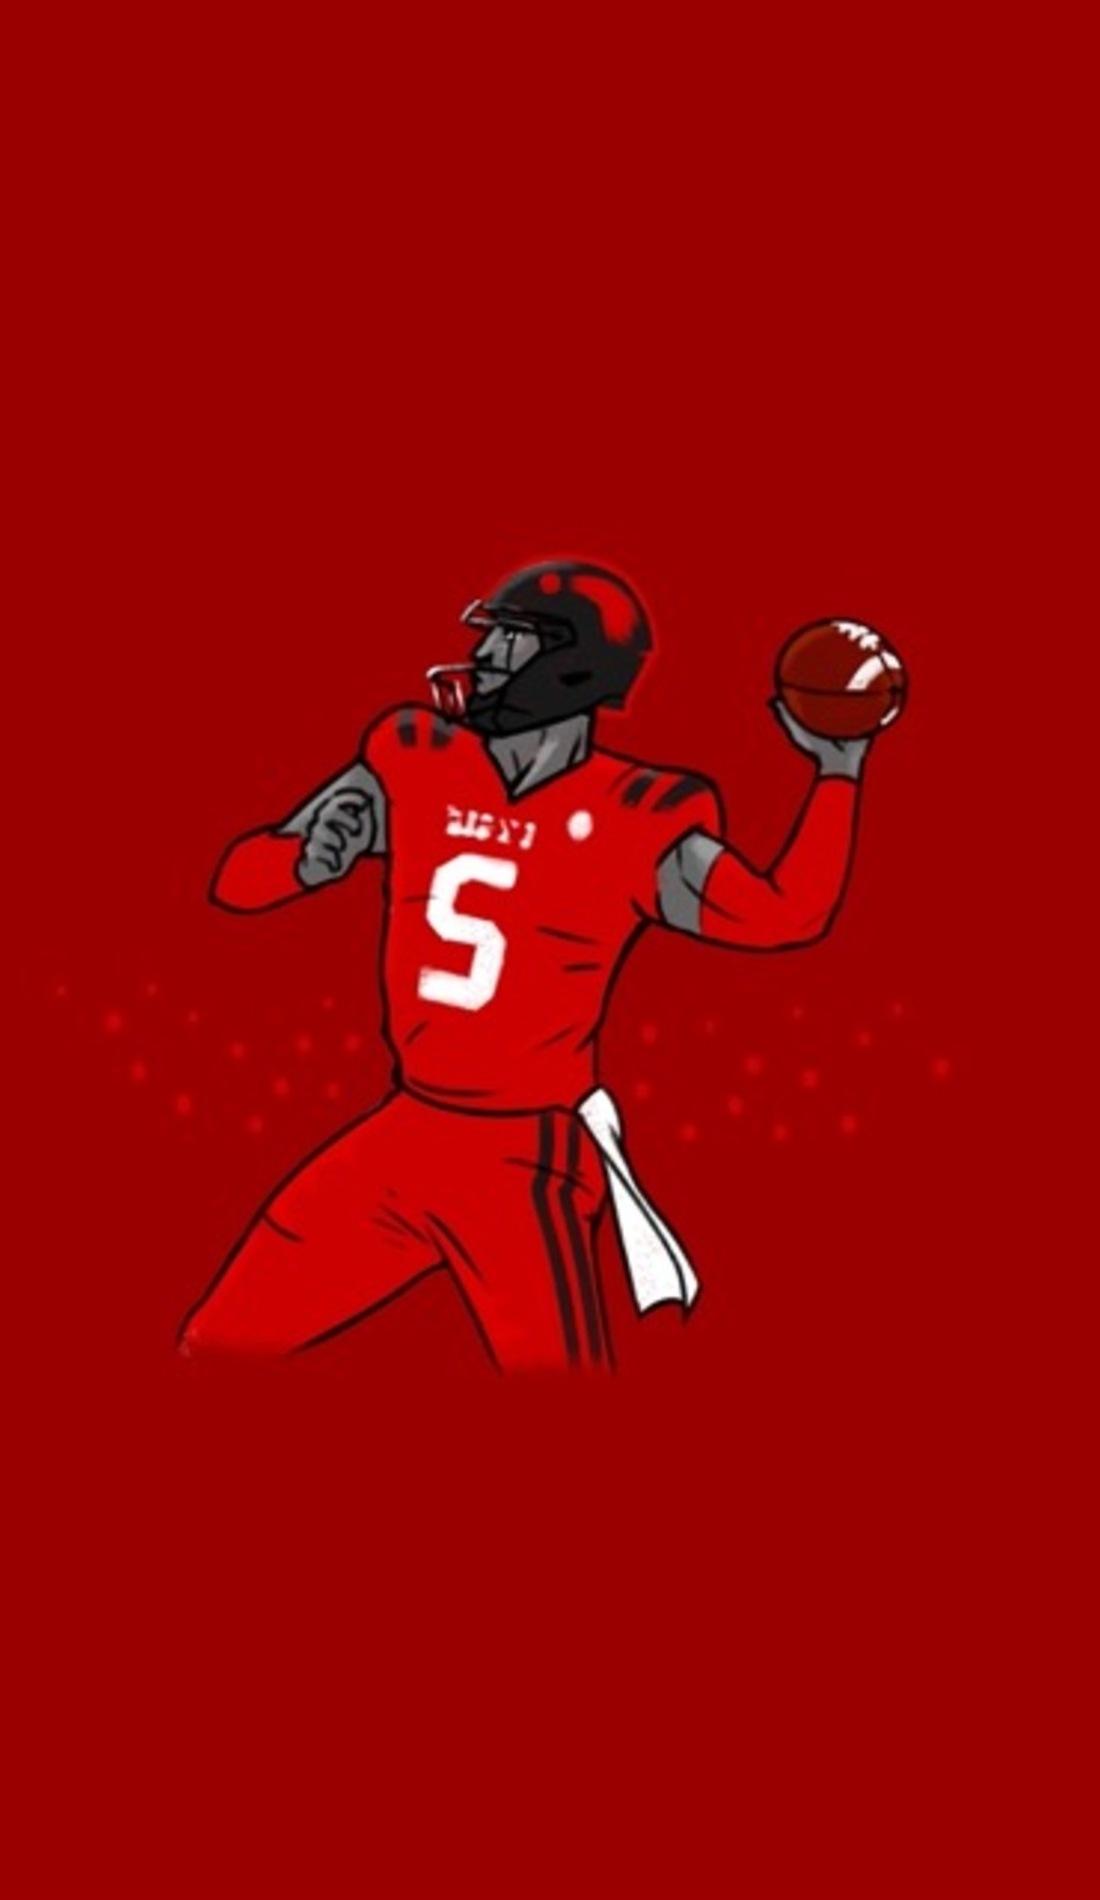 A Texas Tech Red Raiders Football live event